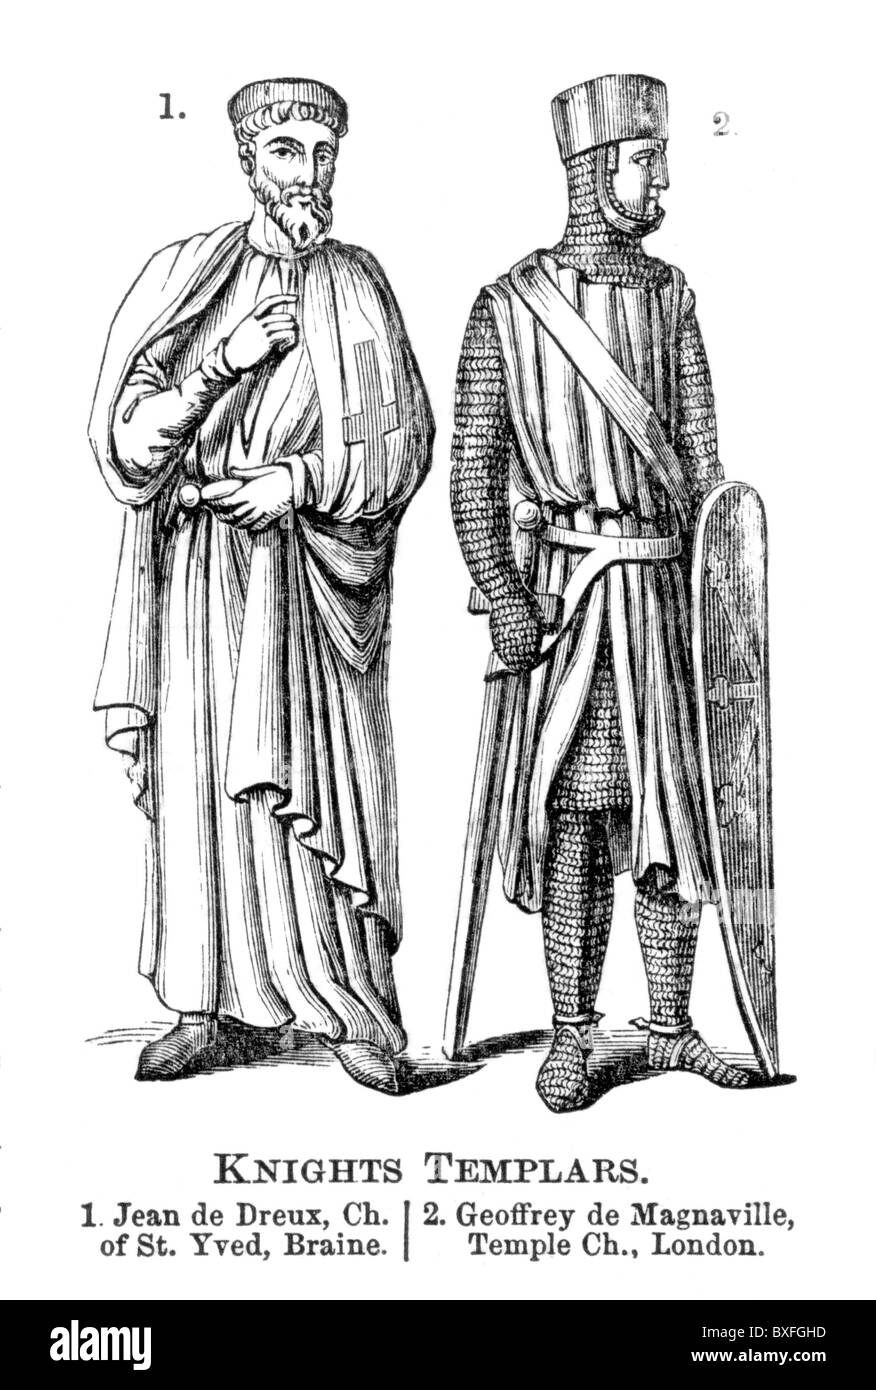 Knights Templar; Jean de Dreux (John Braine) and Geoffrey de Magnaville; 12th century; Black and White Illustration; - Stock Image